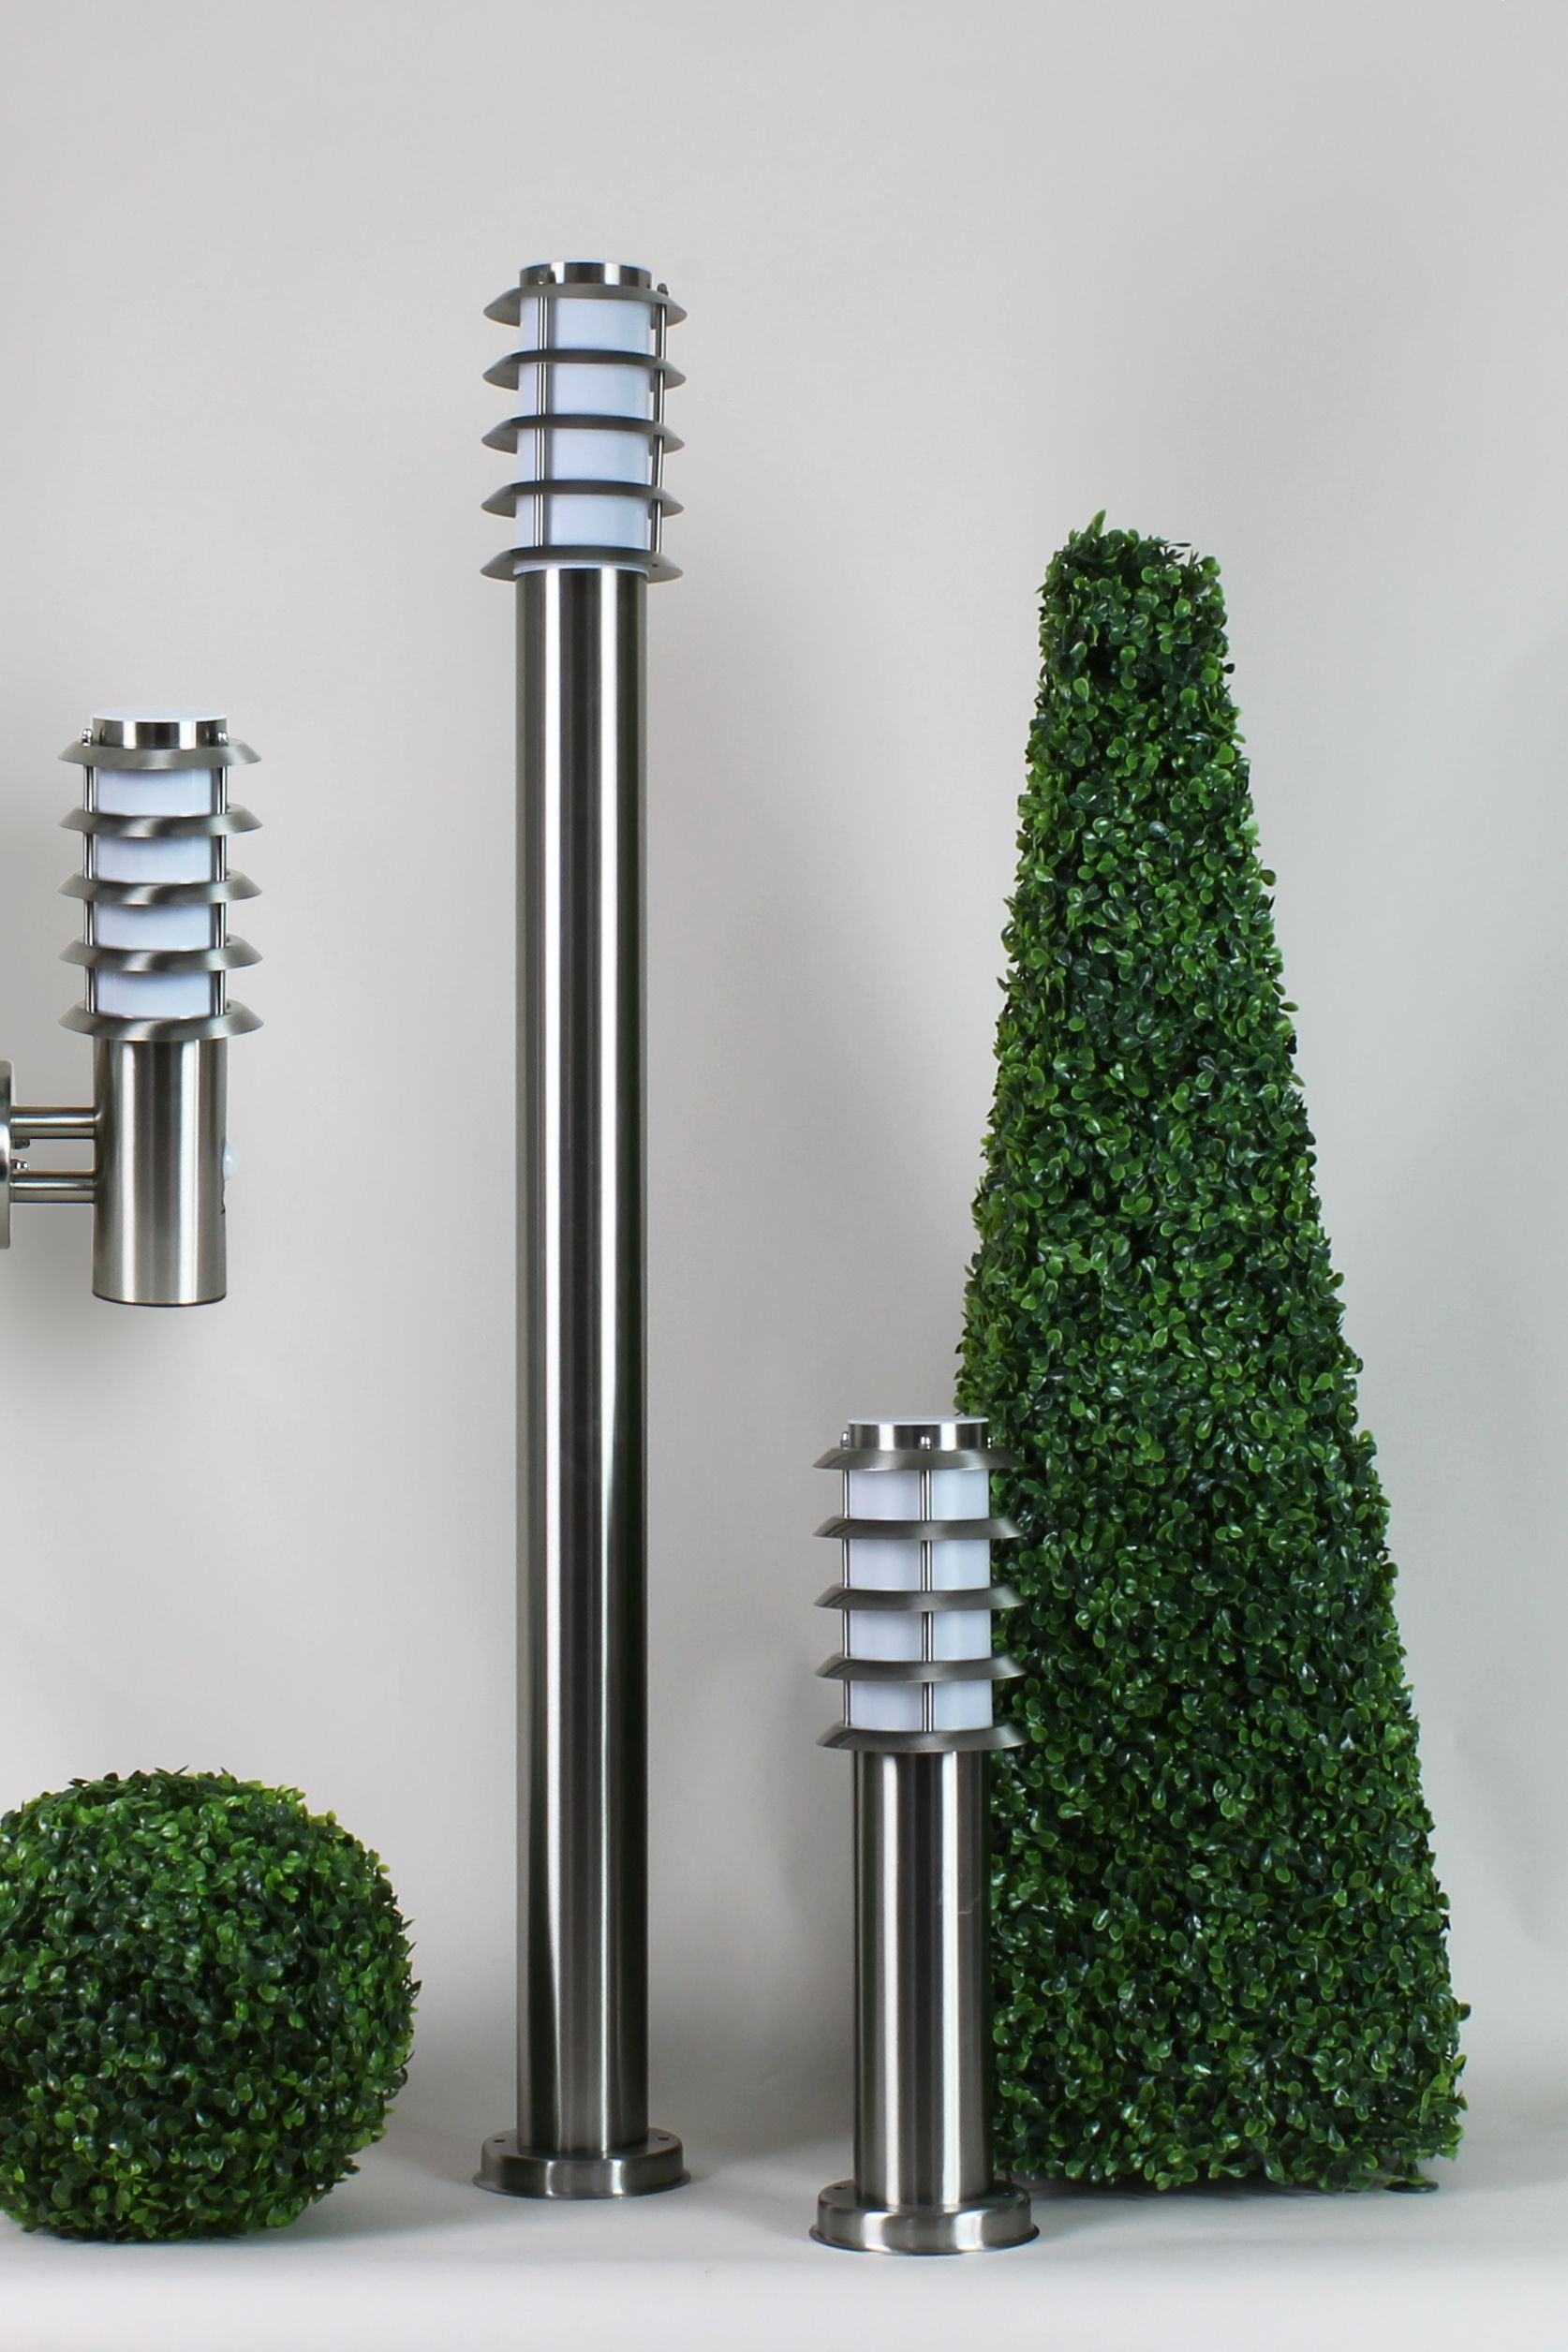 Ecrins lampadaire borne potelet applique outdoor for Luminaire exterieur balcon